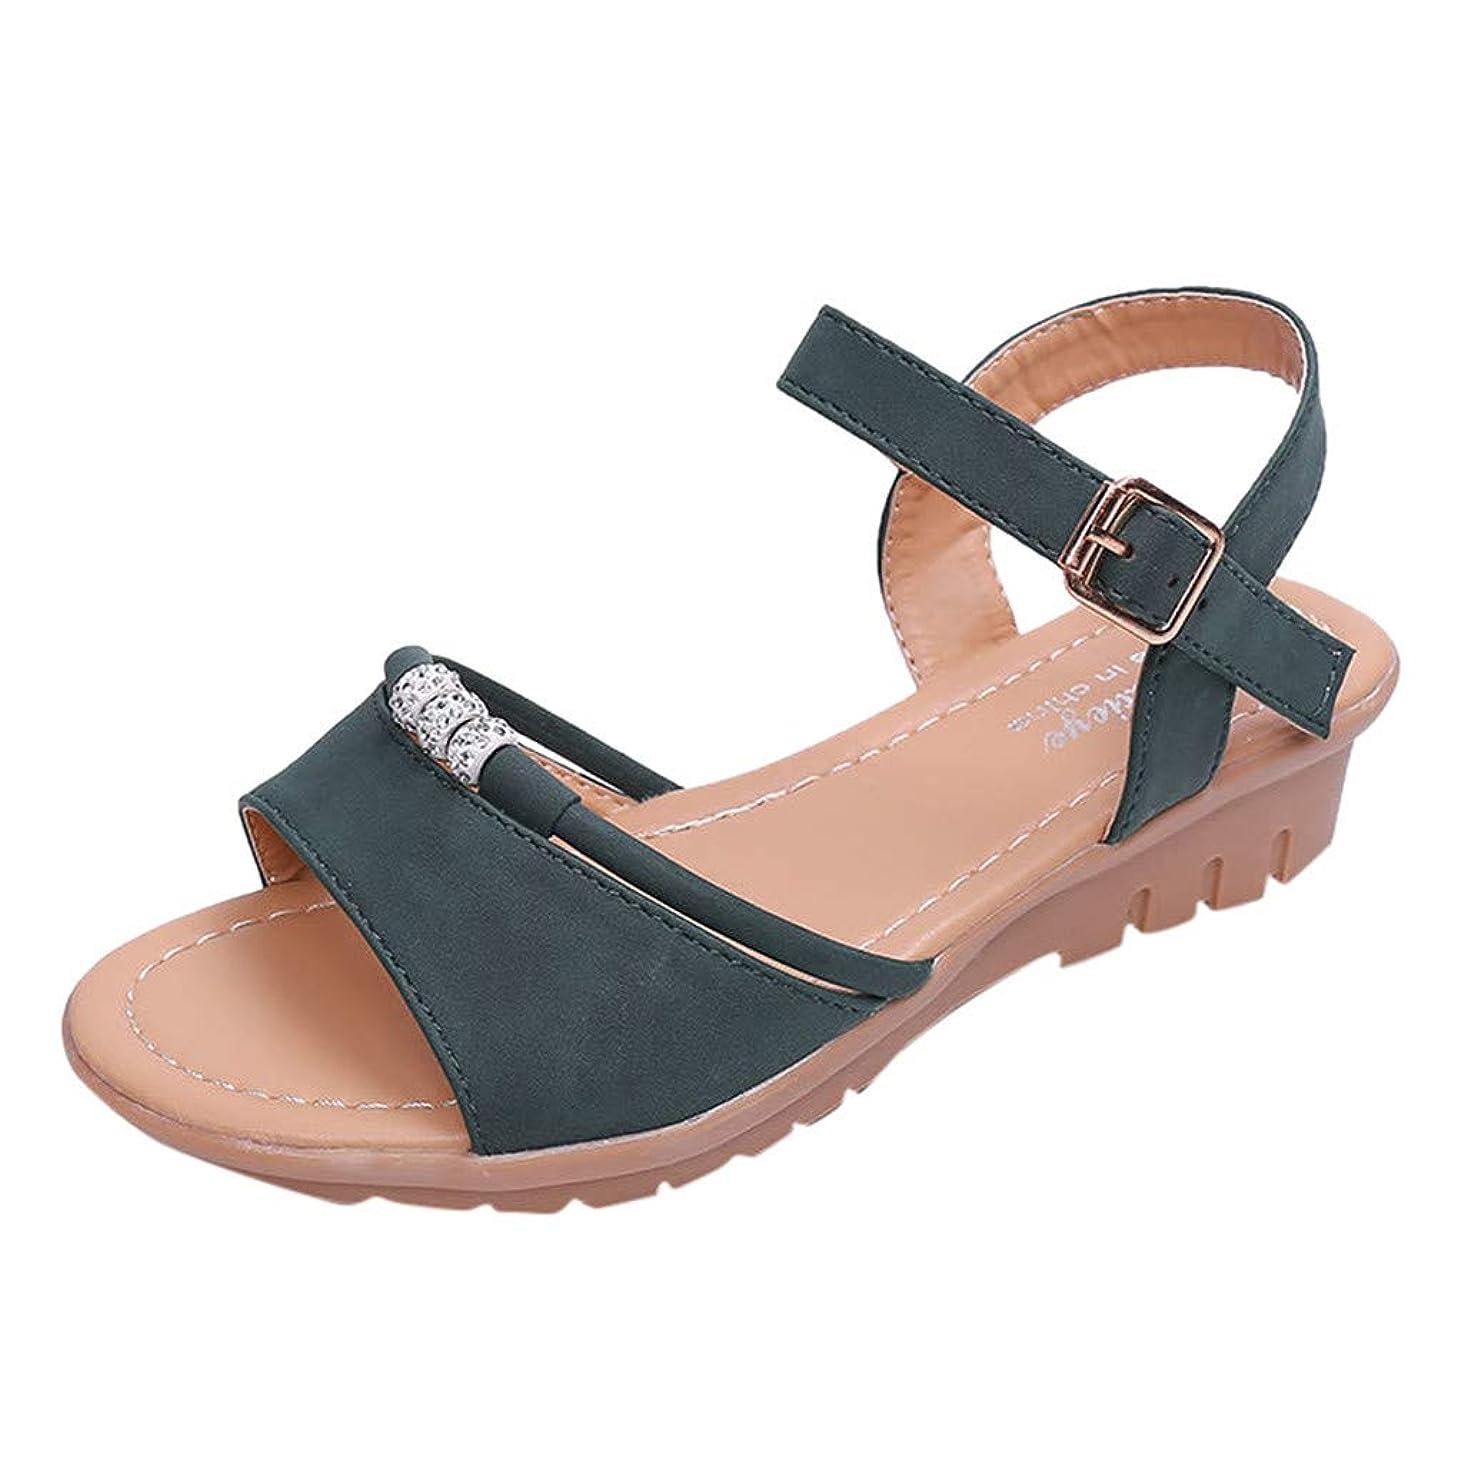 Toimothcn Girls Beach Sandals, Women's Cute Open Toes One Band Ankle Strap Flexible Summer Flat Sandals